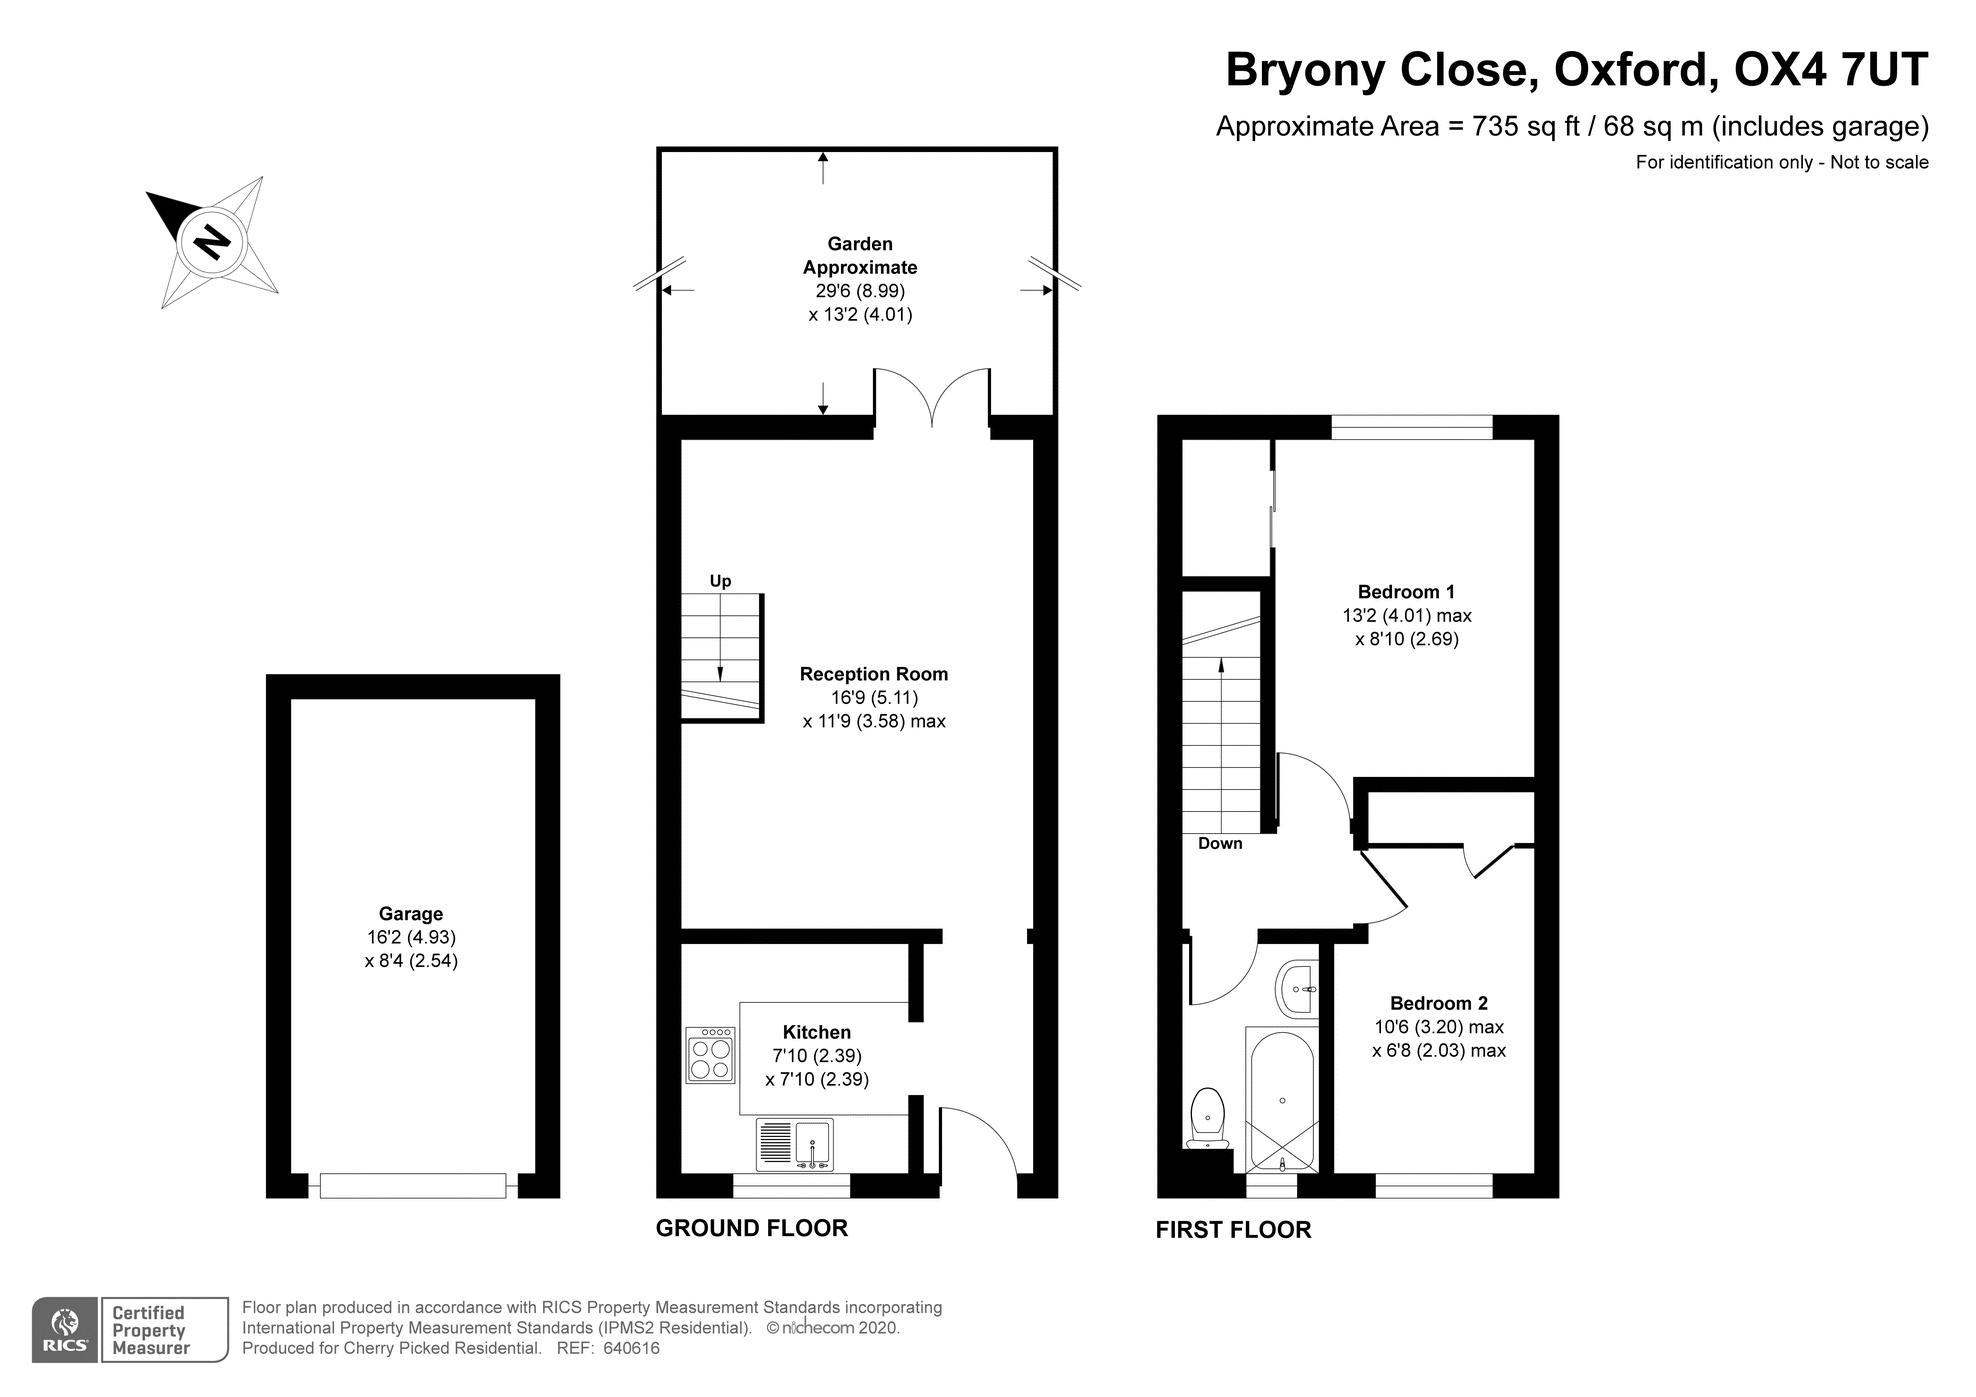 Bryony Close